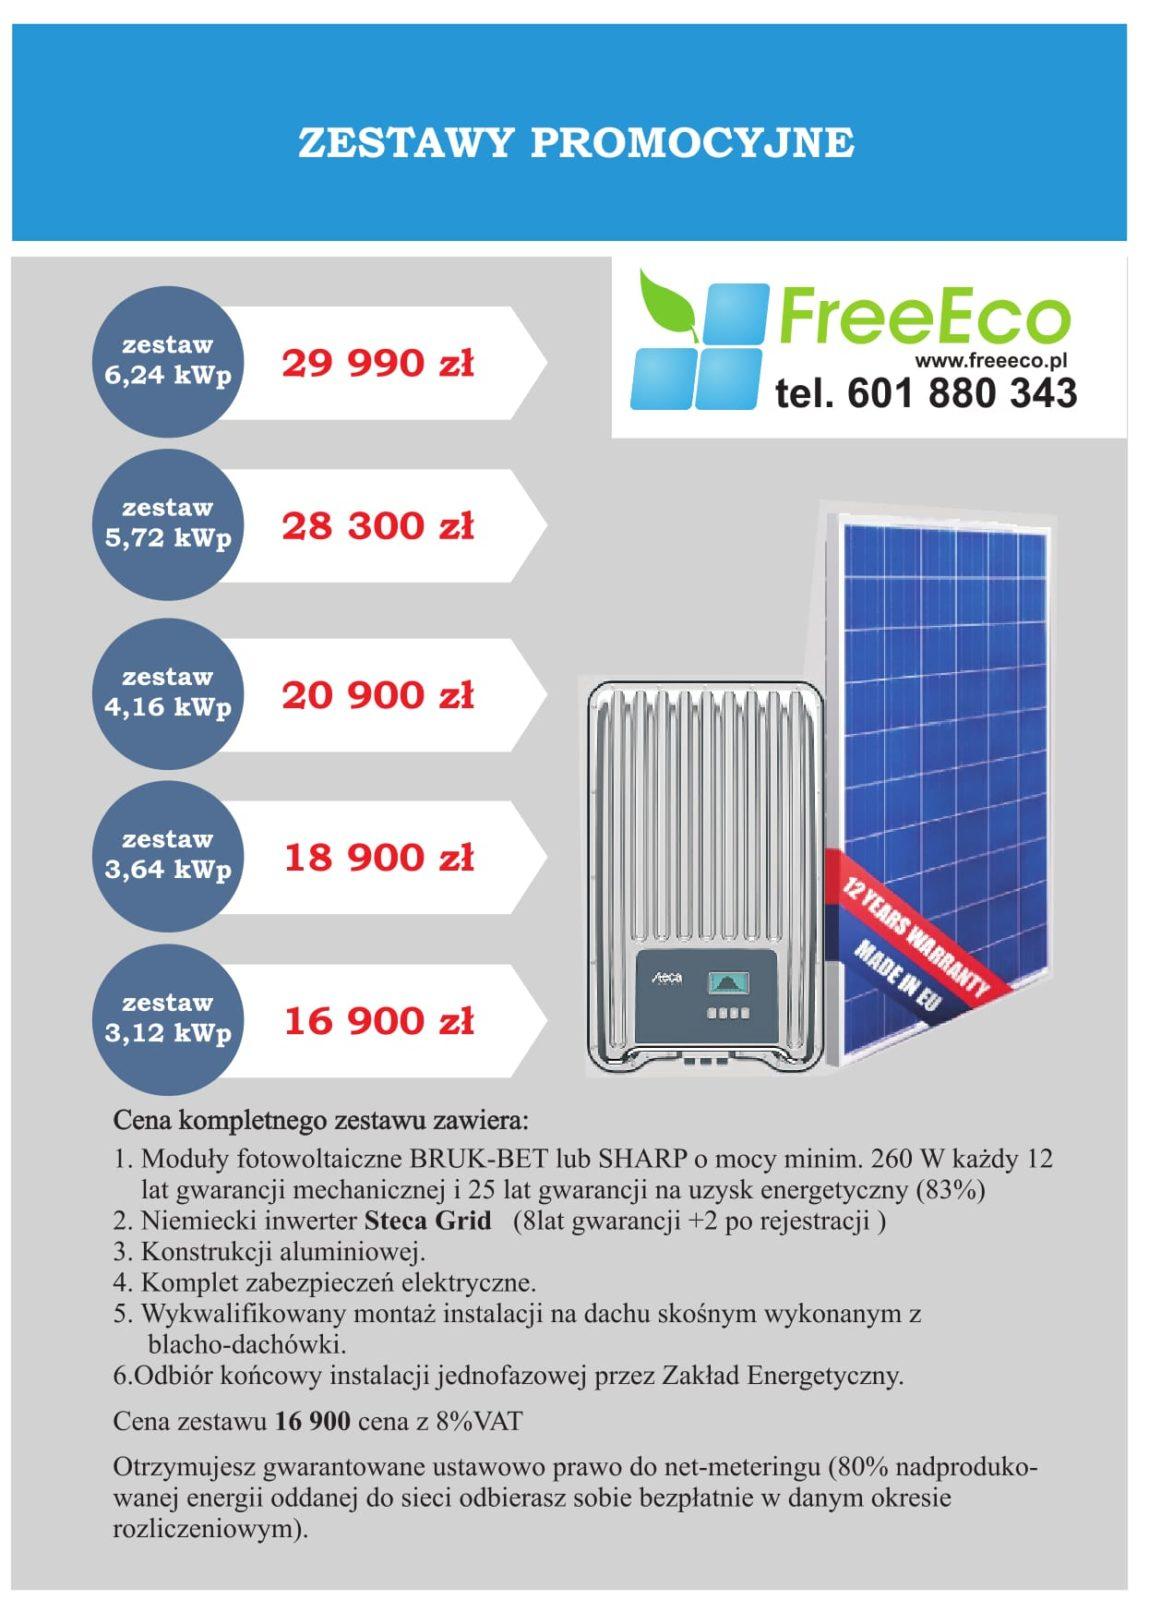 FreeEco Ulotka2_A (1)-1